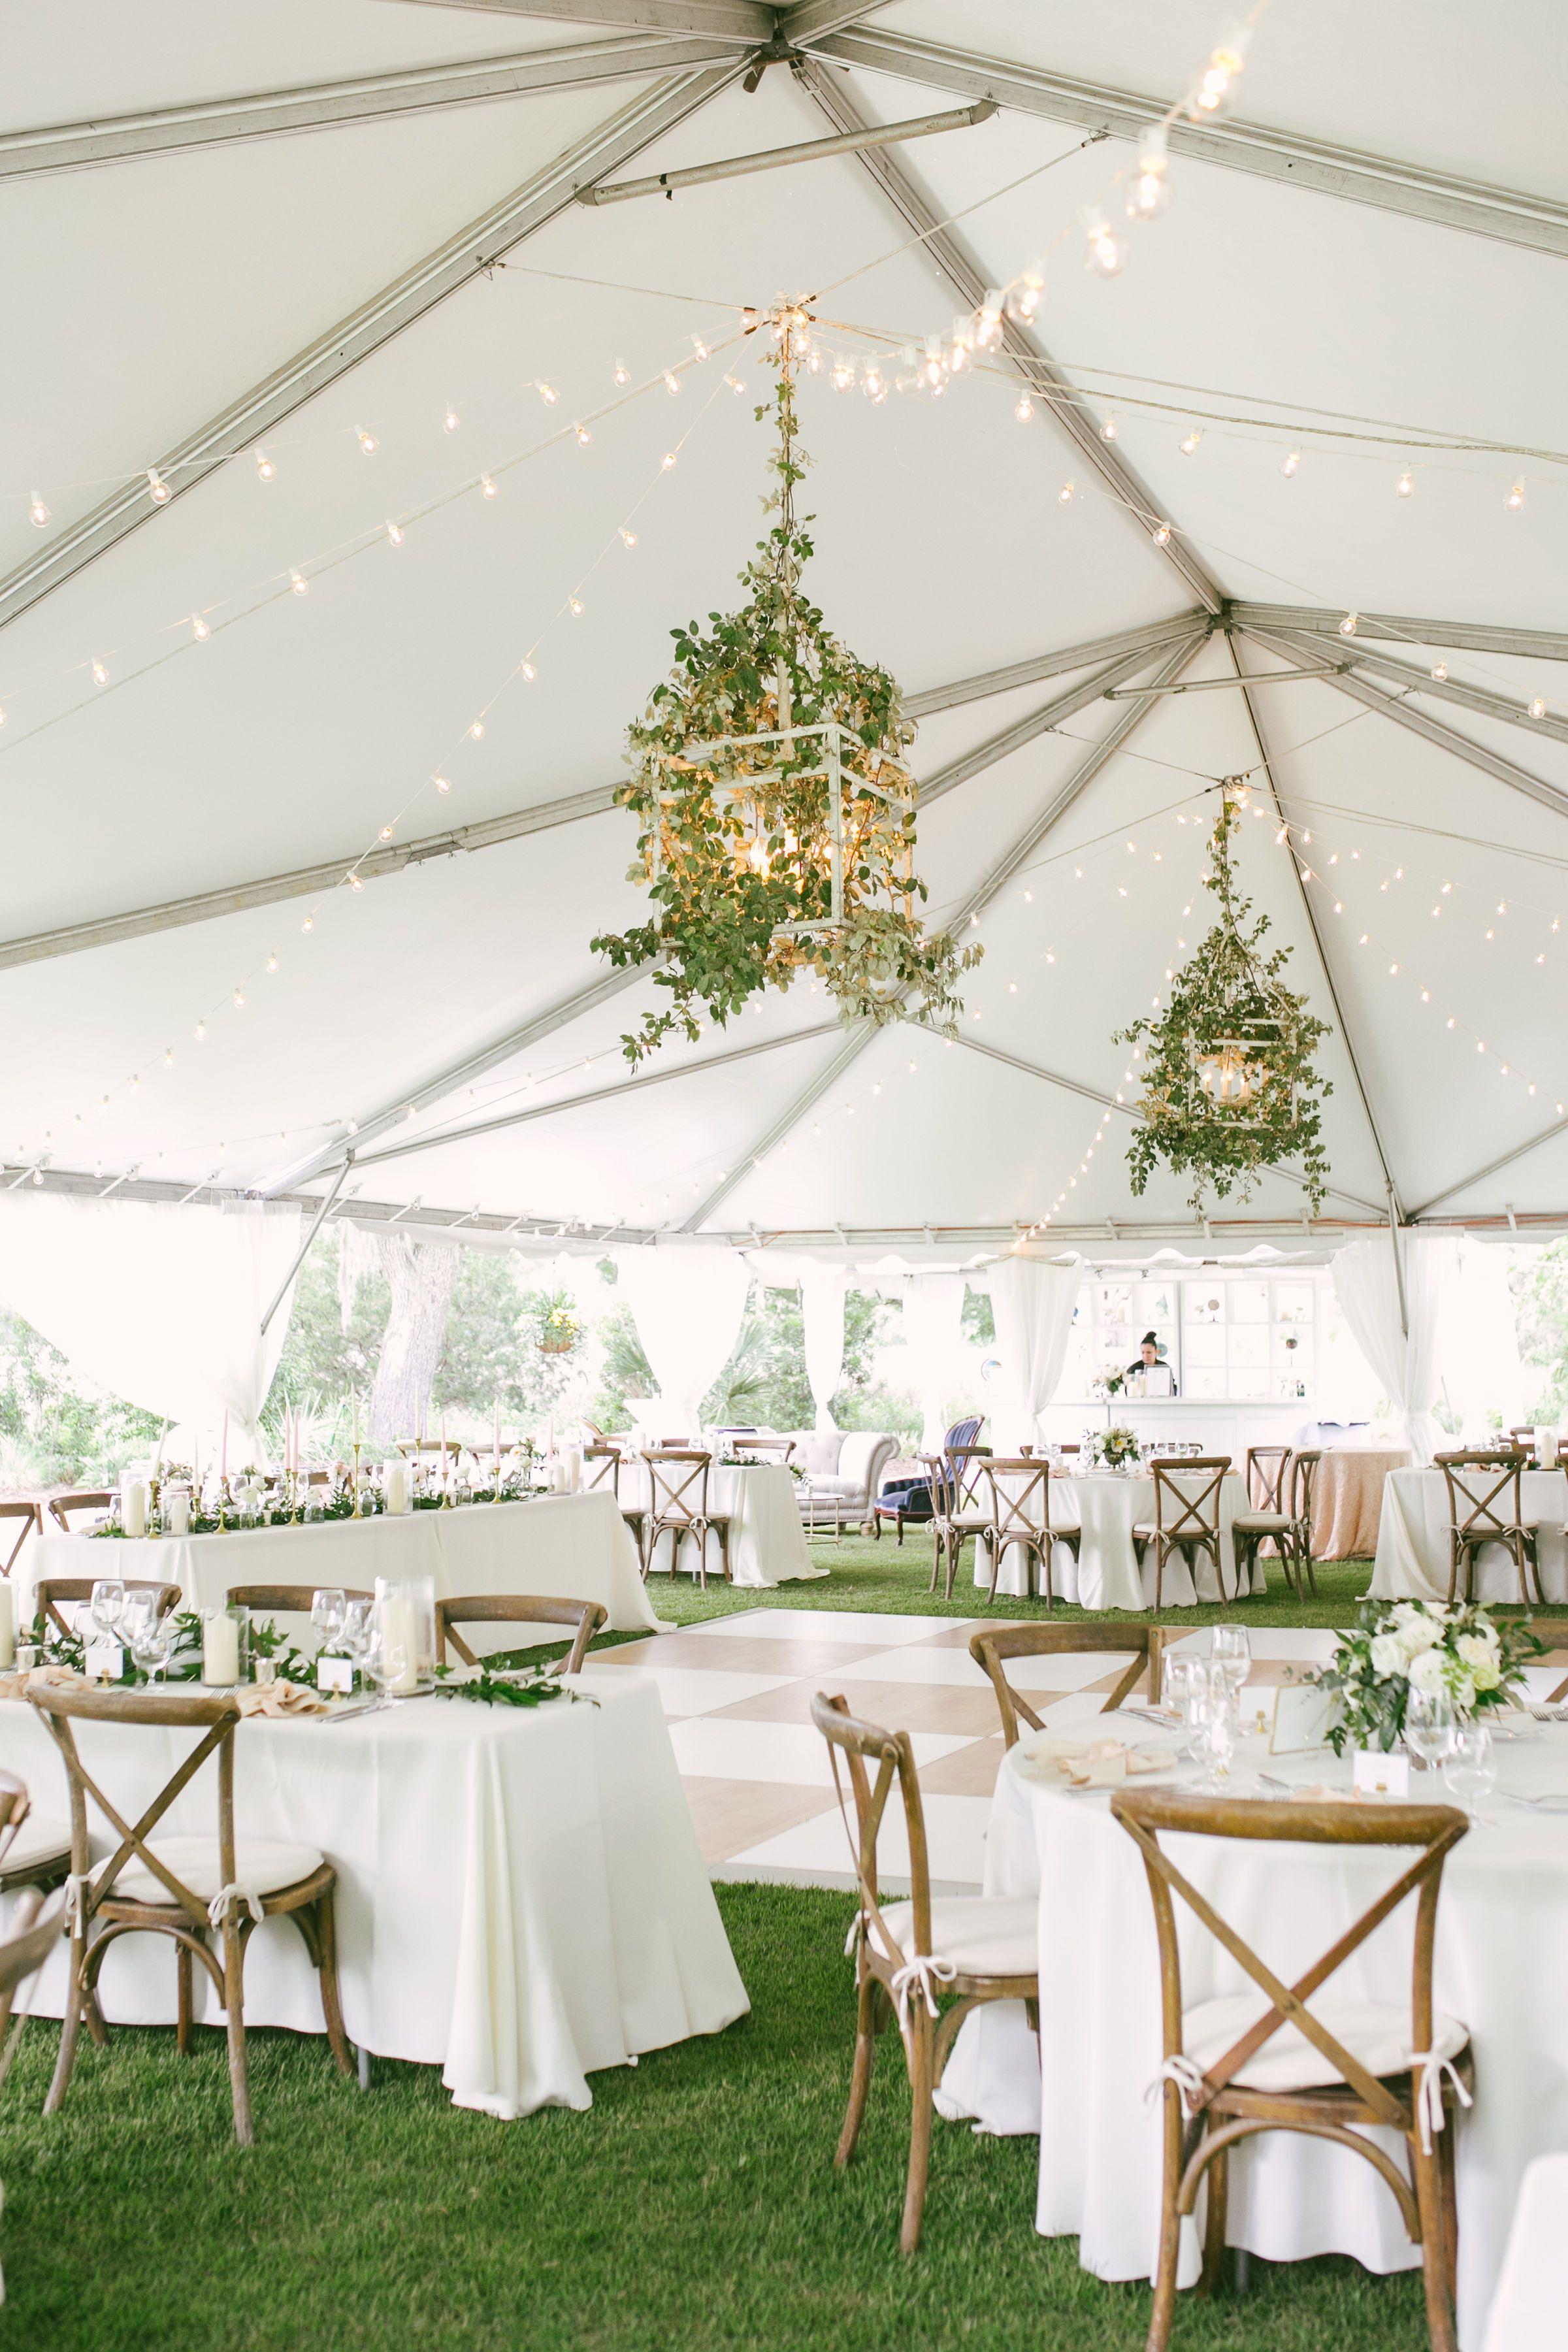 Elegant Backyard Wedding Elegant Backyard Wedding Outdoor Tent Wedding Wedding Backyard Reception